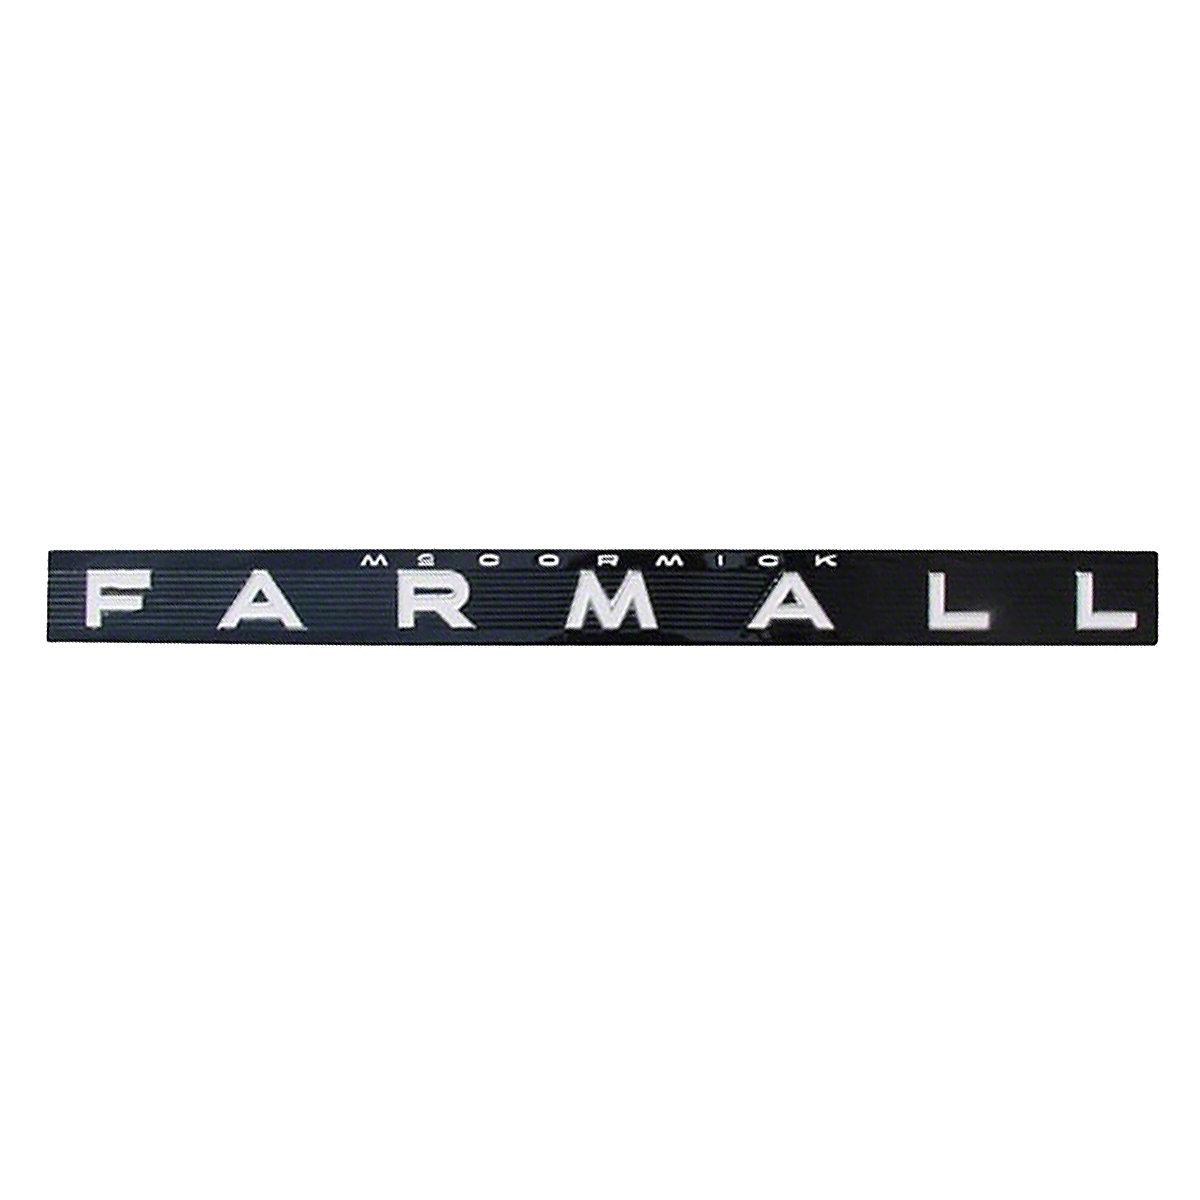 Rep118 Operators Manual Ih 656 International Wiring Diagram Farmall Side Emblem Fits 504 706 806 1206